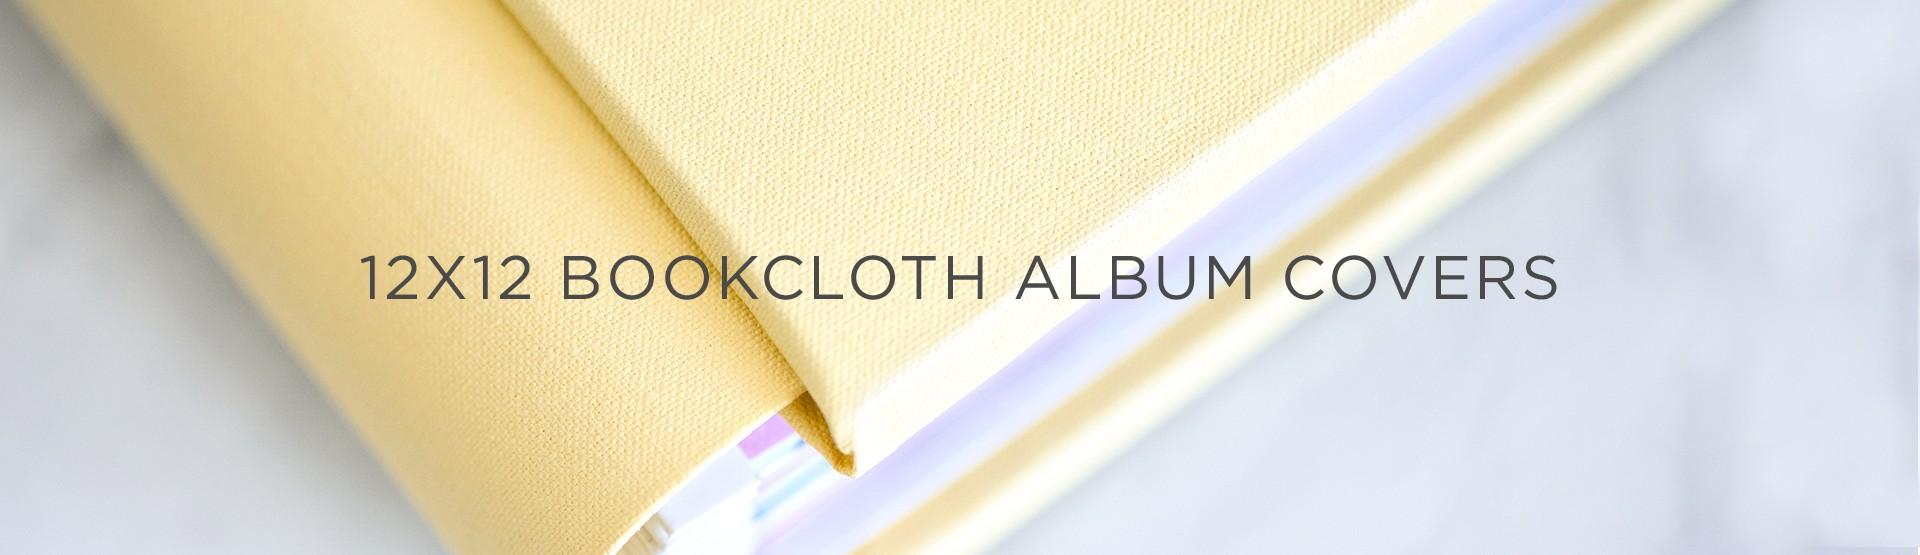 12x12 Bookcloth Album Covers